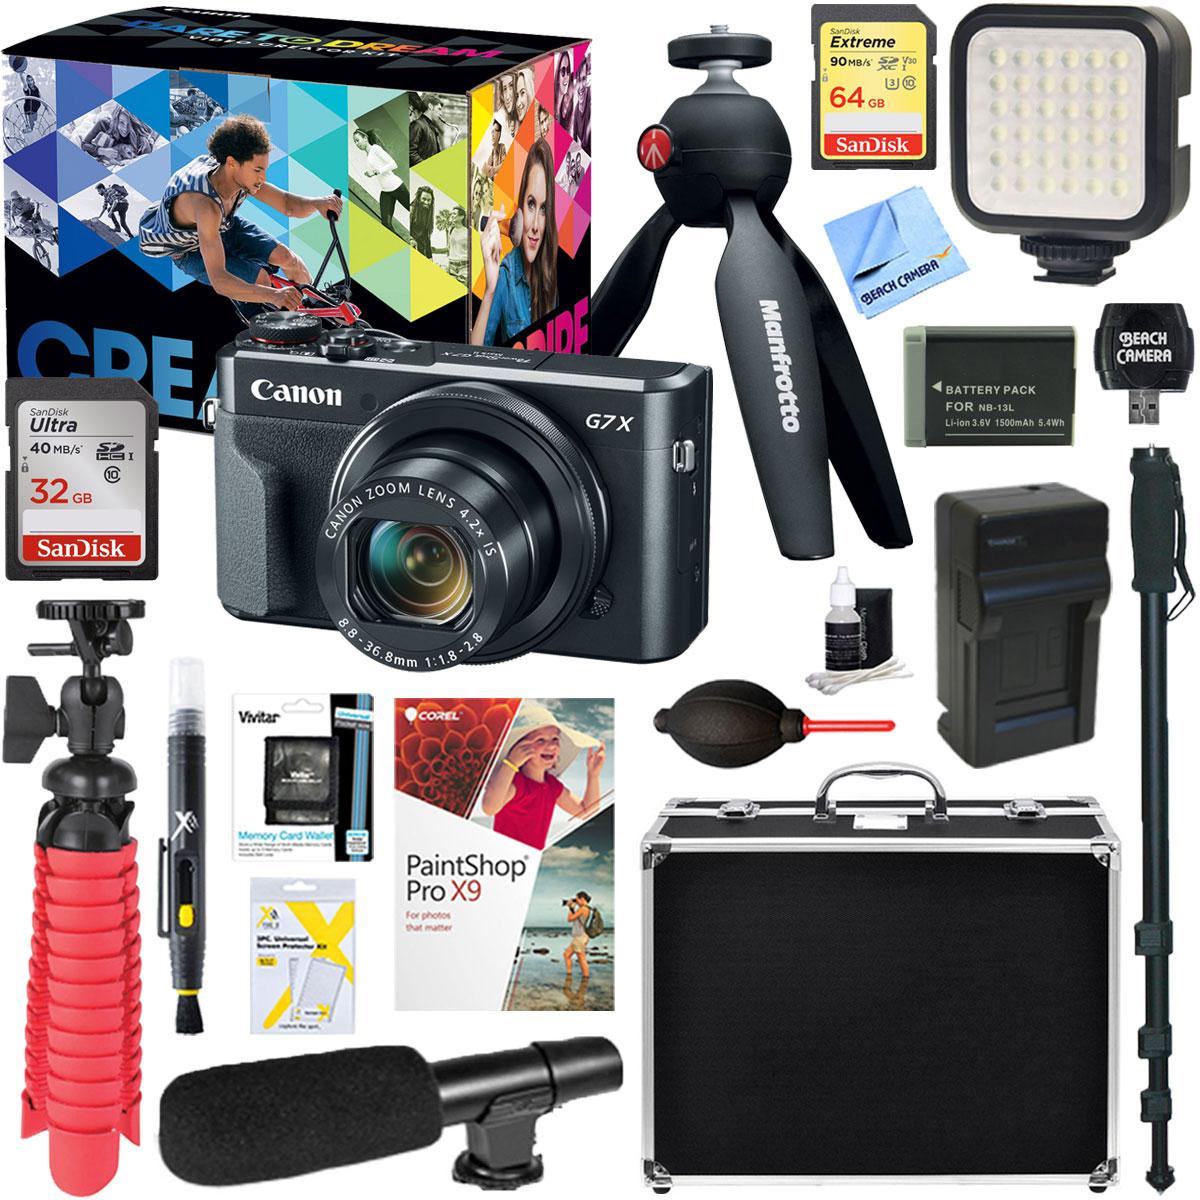 Canon PowerShot G7 X Mark II 20.1MP 4.2x Optical Zoom Digital Camera Video Creator Kit + Universal Microphone & 64GB Accessory Bundle